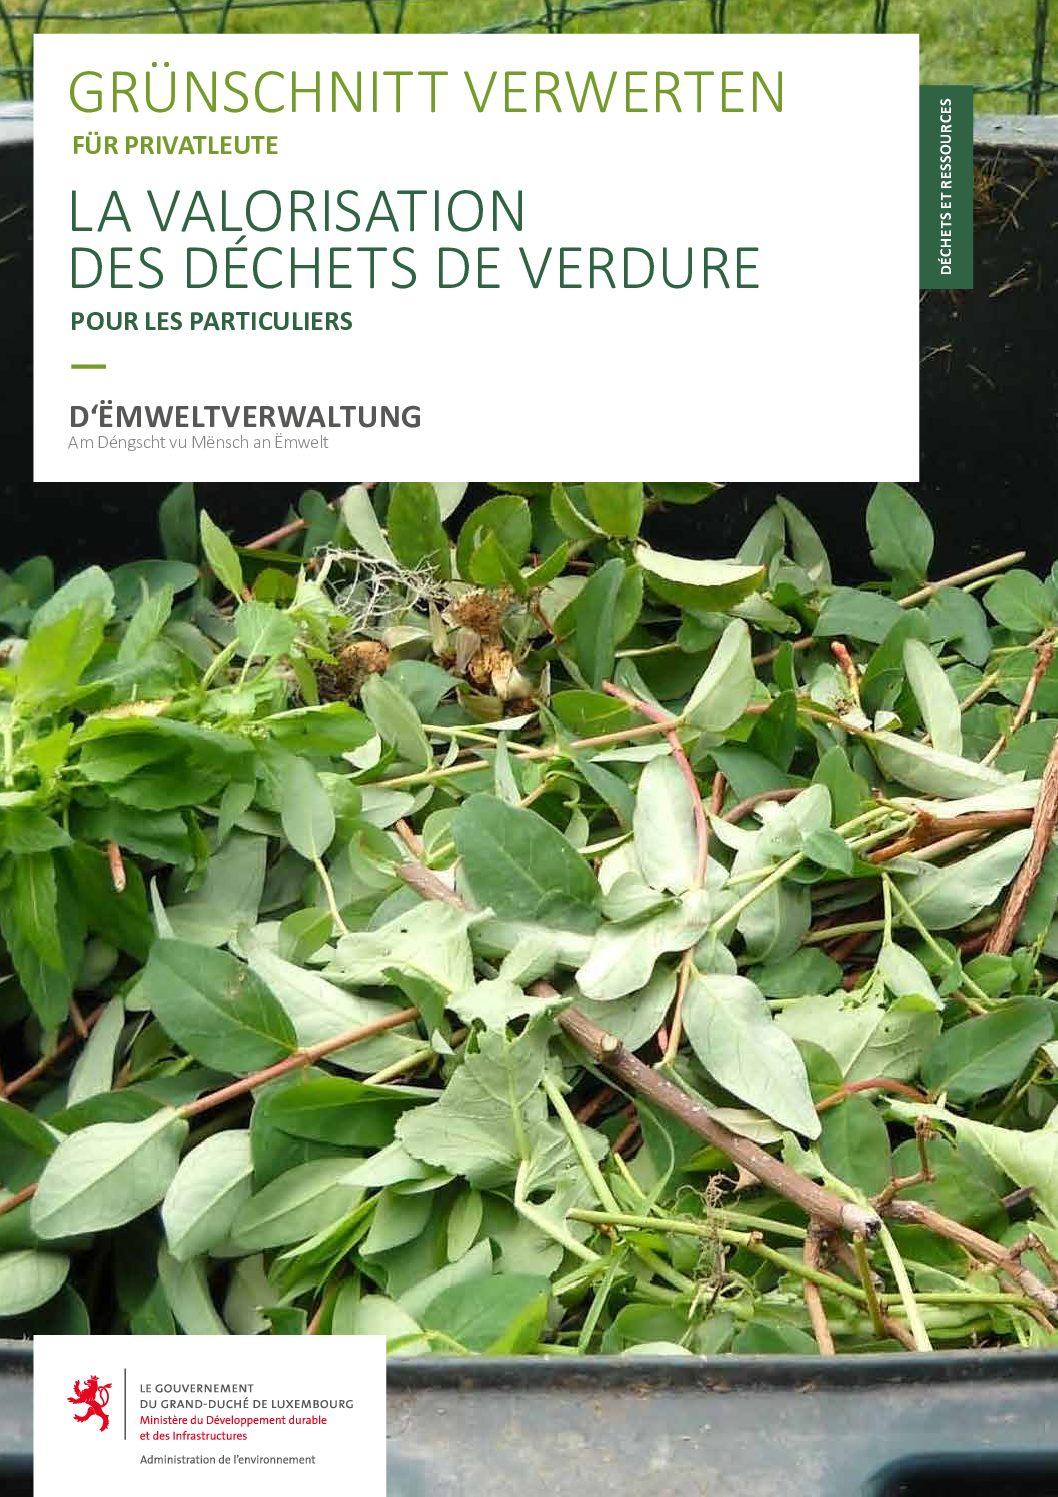 La valorisation des déchêts de verdure - Grünschnitt verwerten